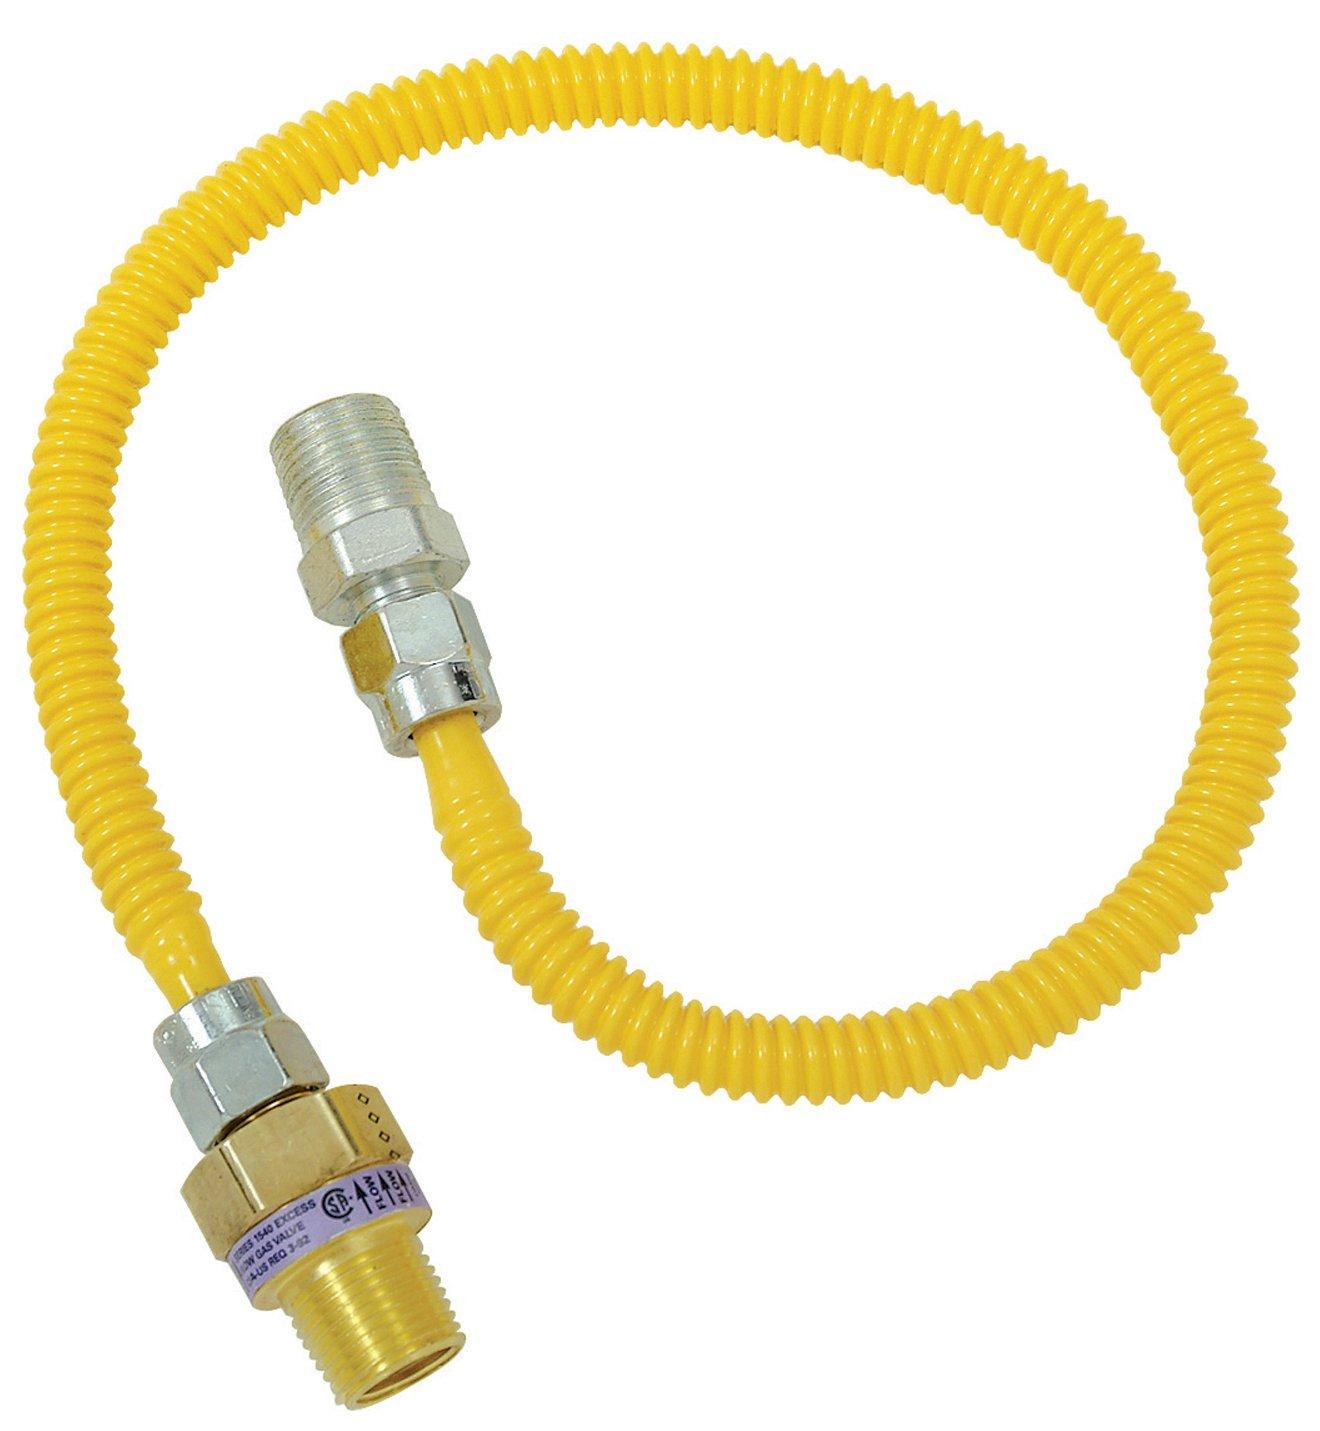 Plumb Shop Brasscraft CSSL44E-24P 1/2-Inch MIP x 3/8-Inch MIP x 24-Inch Gas Connector